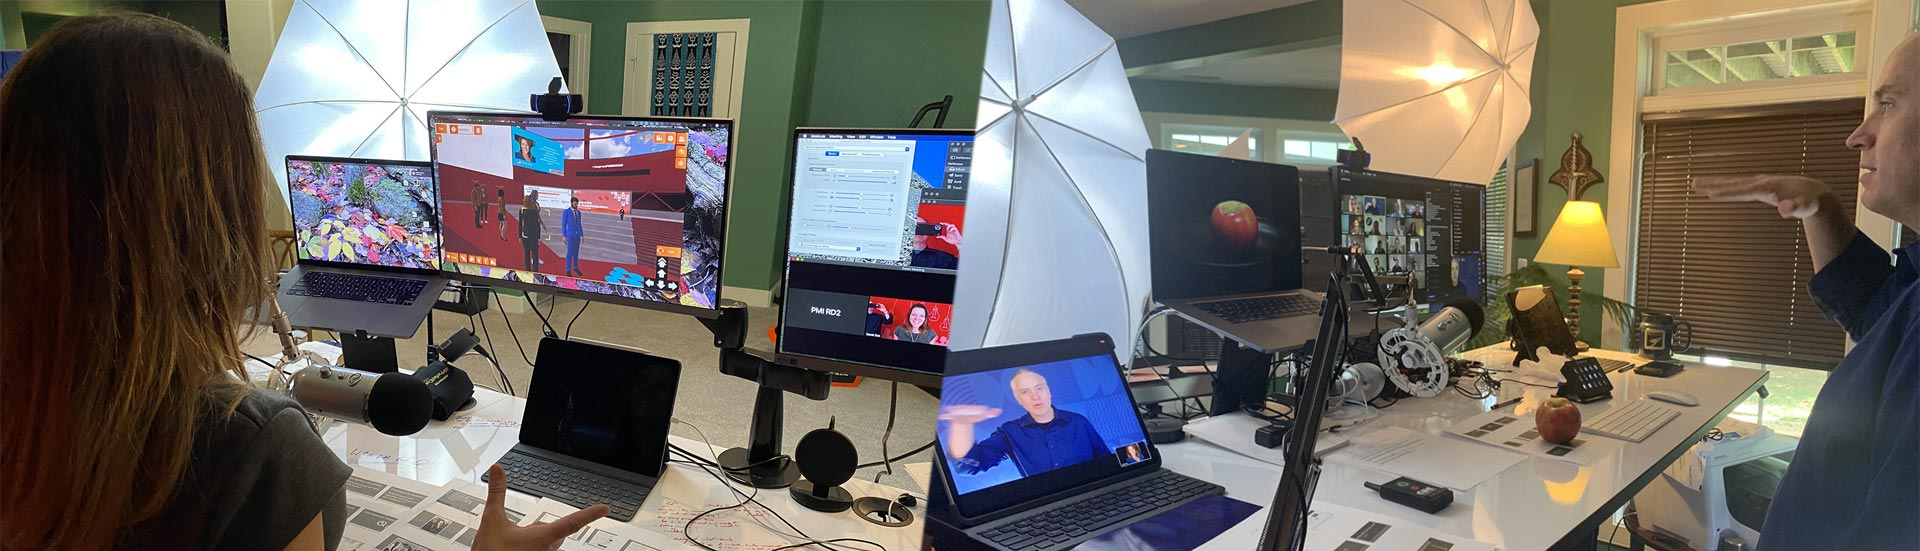 Online Leadership Training with Karin Hurt and David Dye